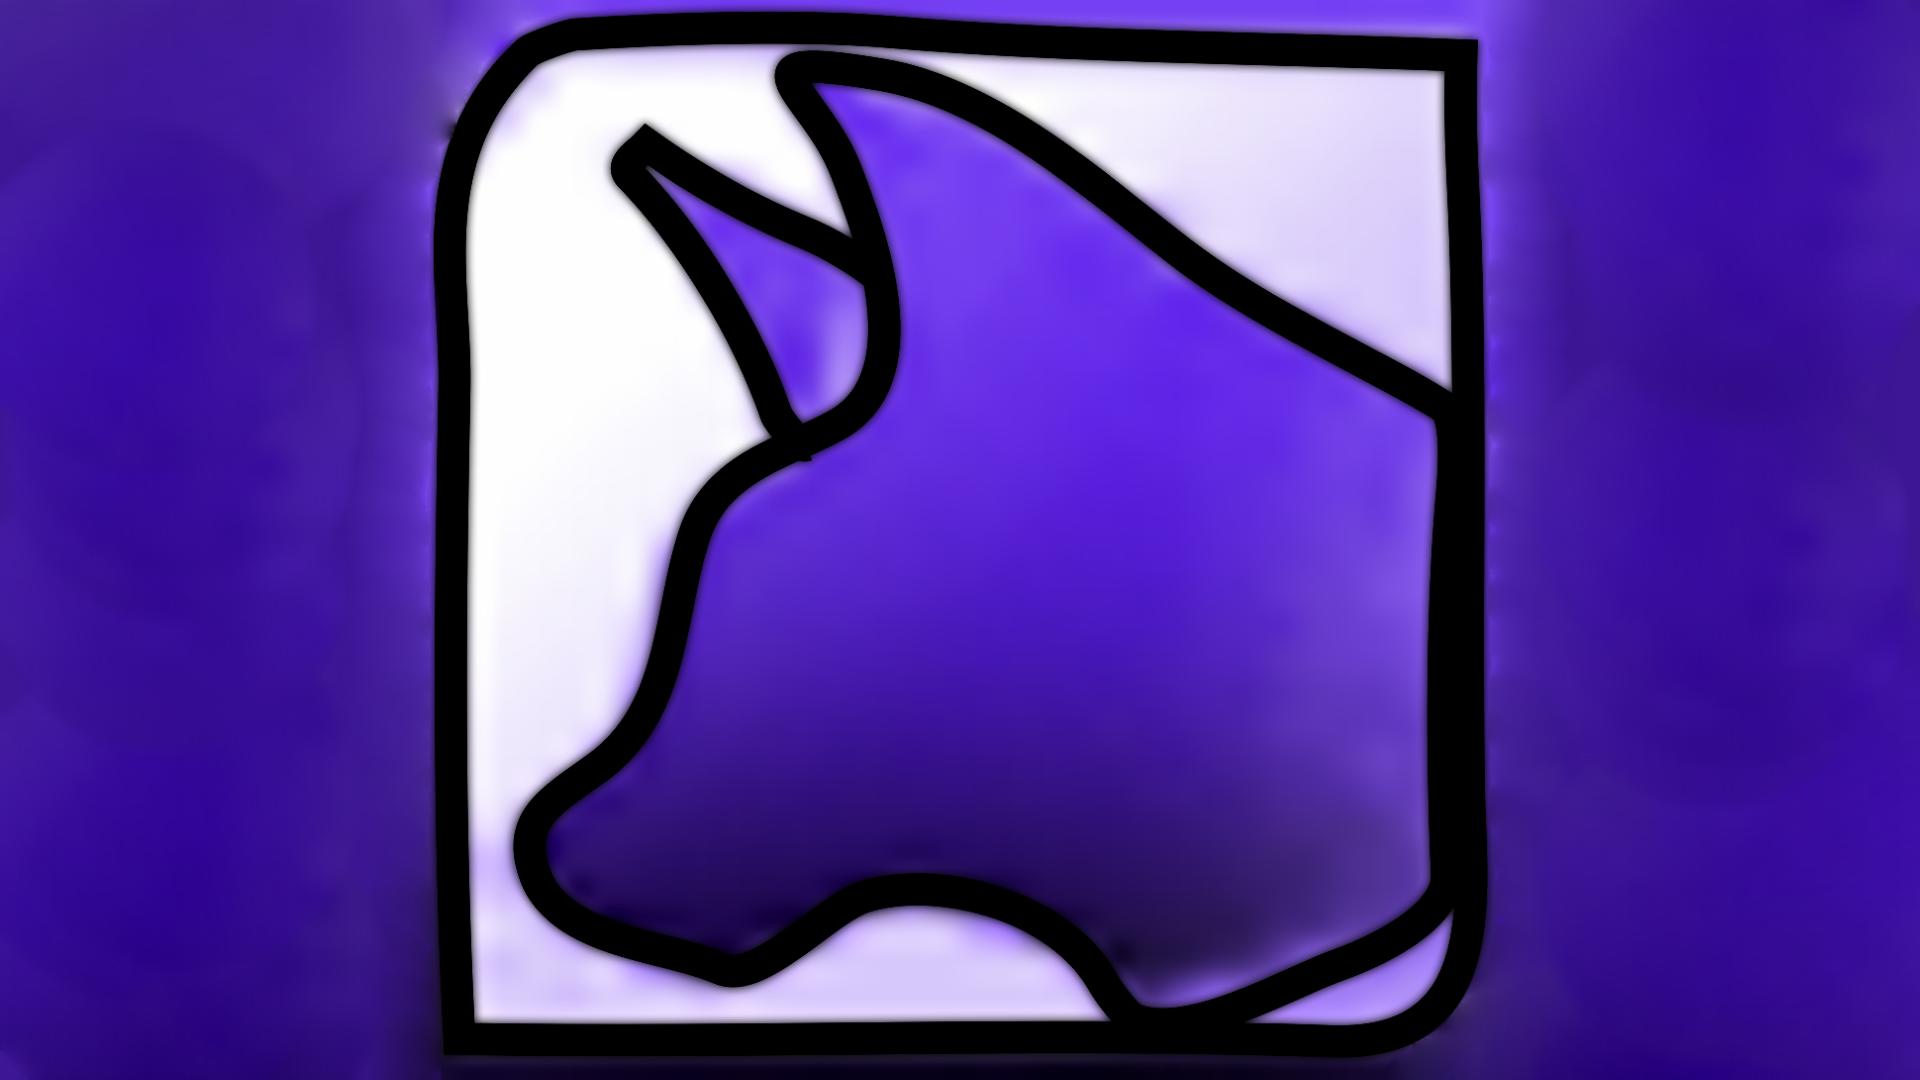 HF pAppLoc v1 2 file - WOLF RPG Editor - Mod DB